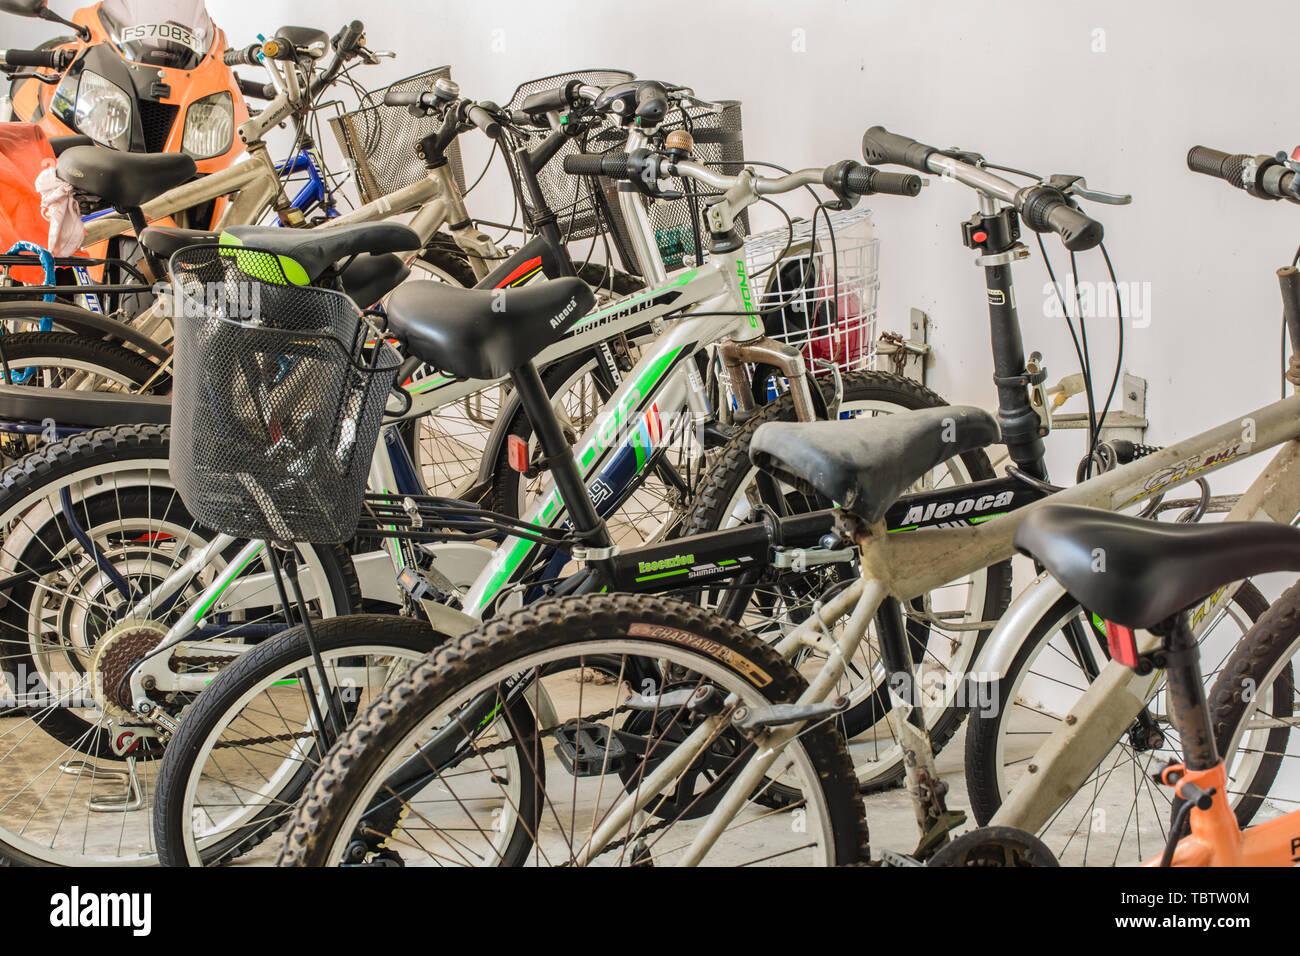 SINGAPORE-JUN 17 2017:bikes in basement car park - Stock Image